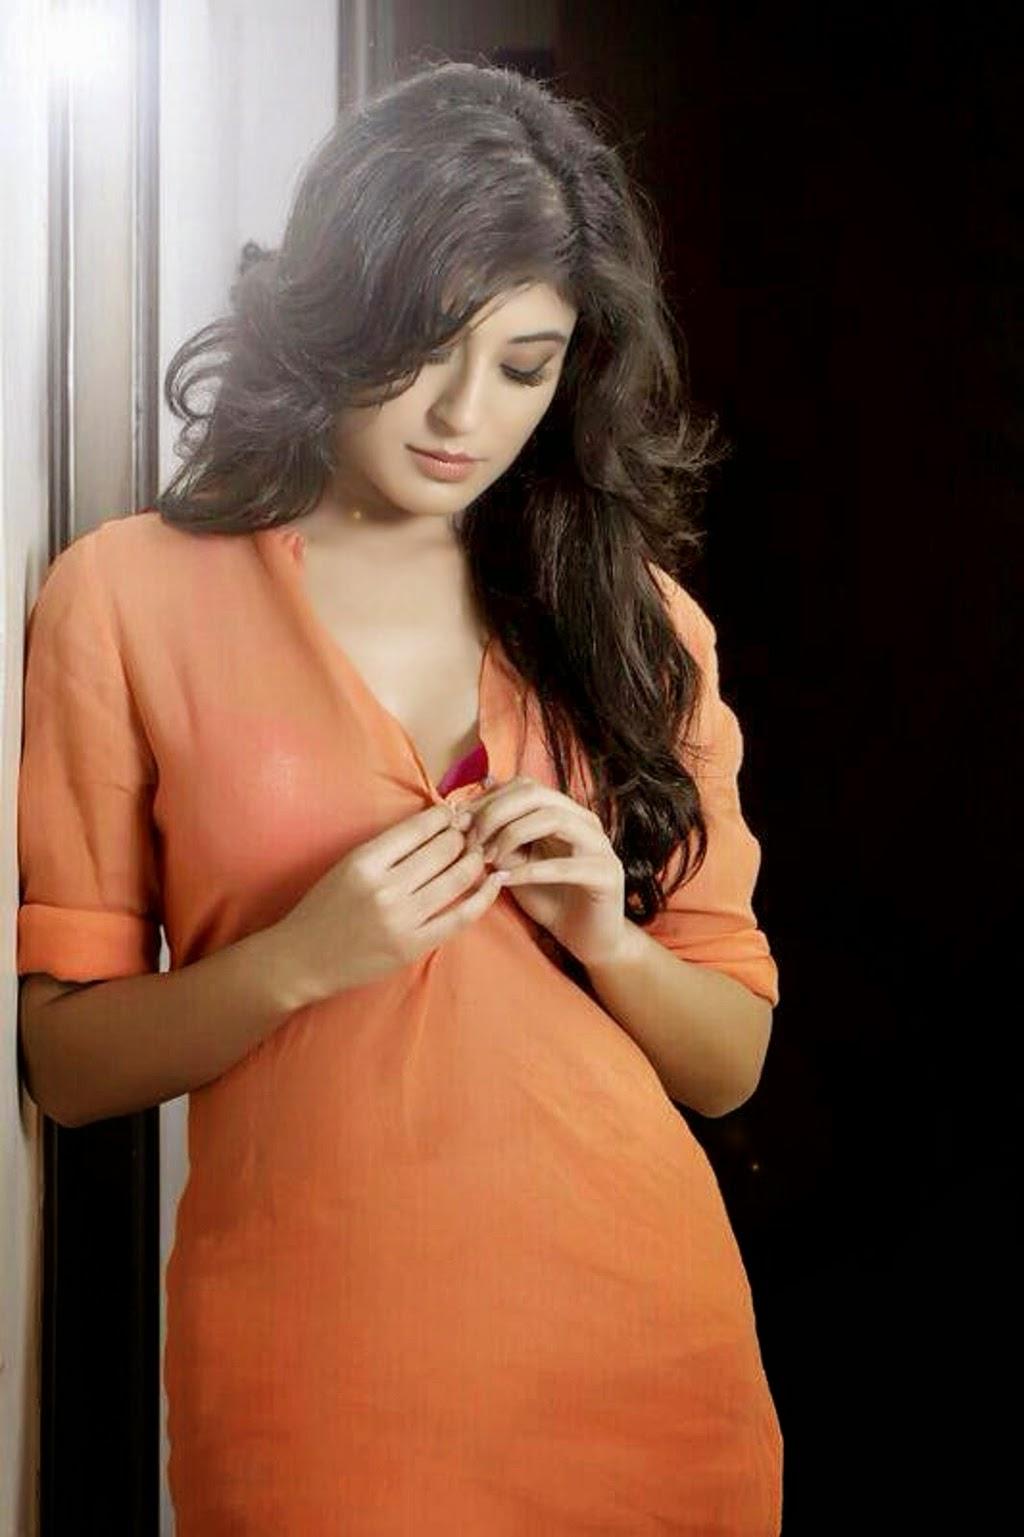 Kritika kamra hot and cute pics